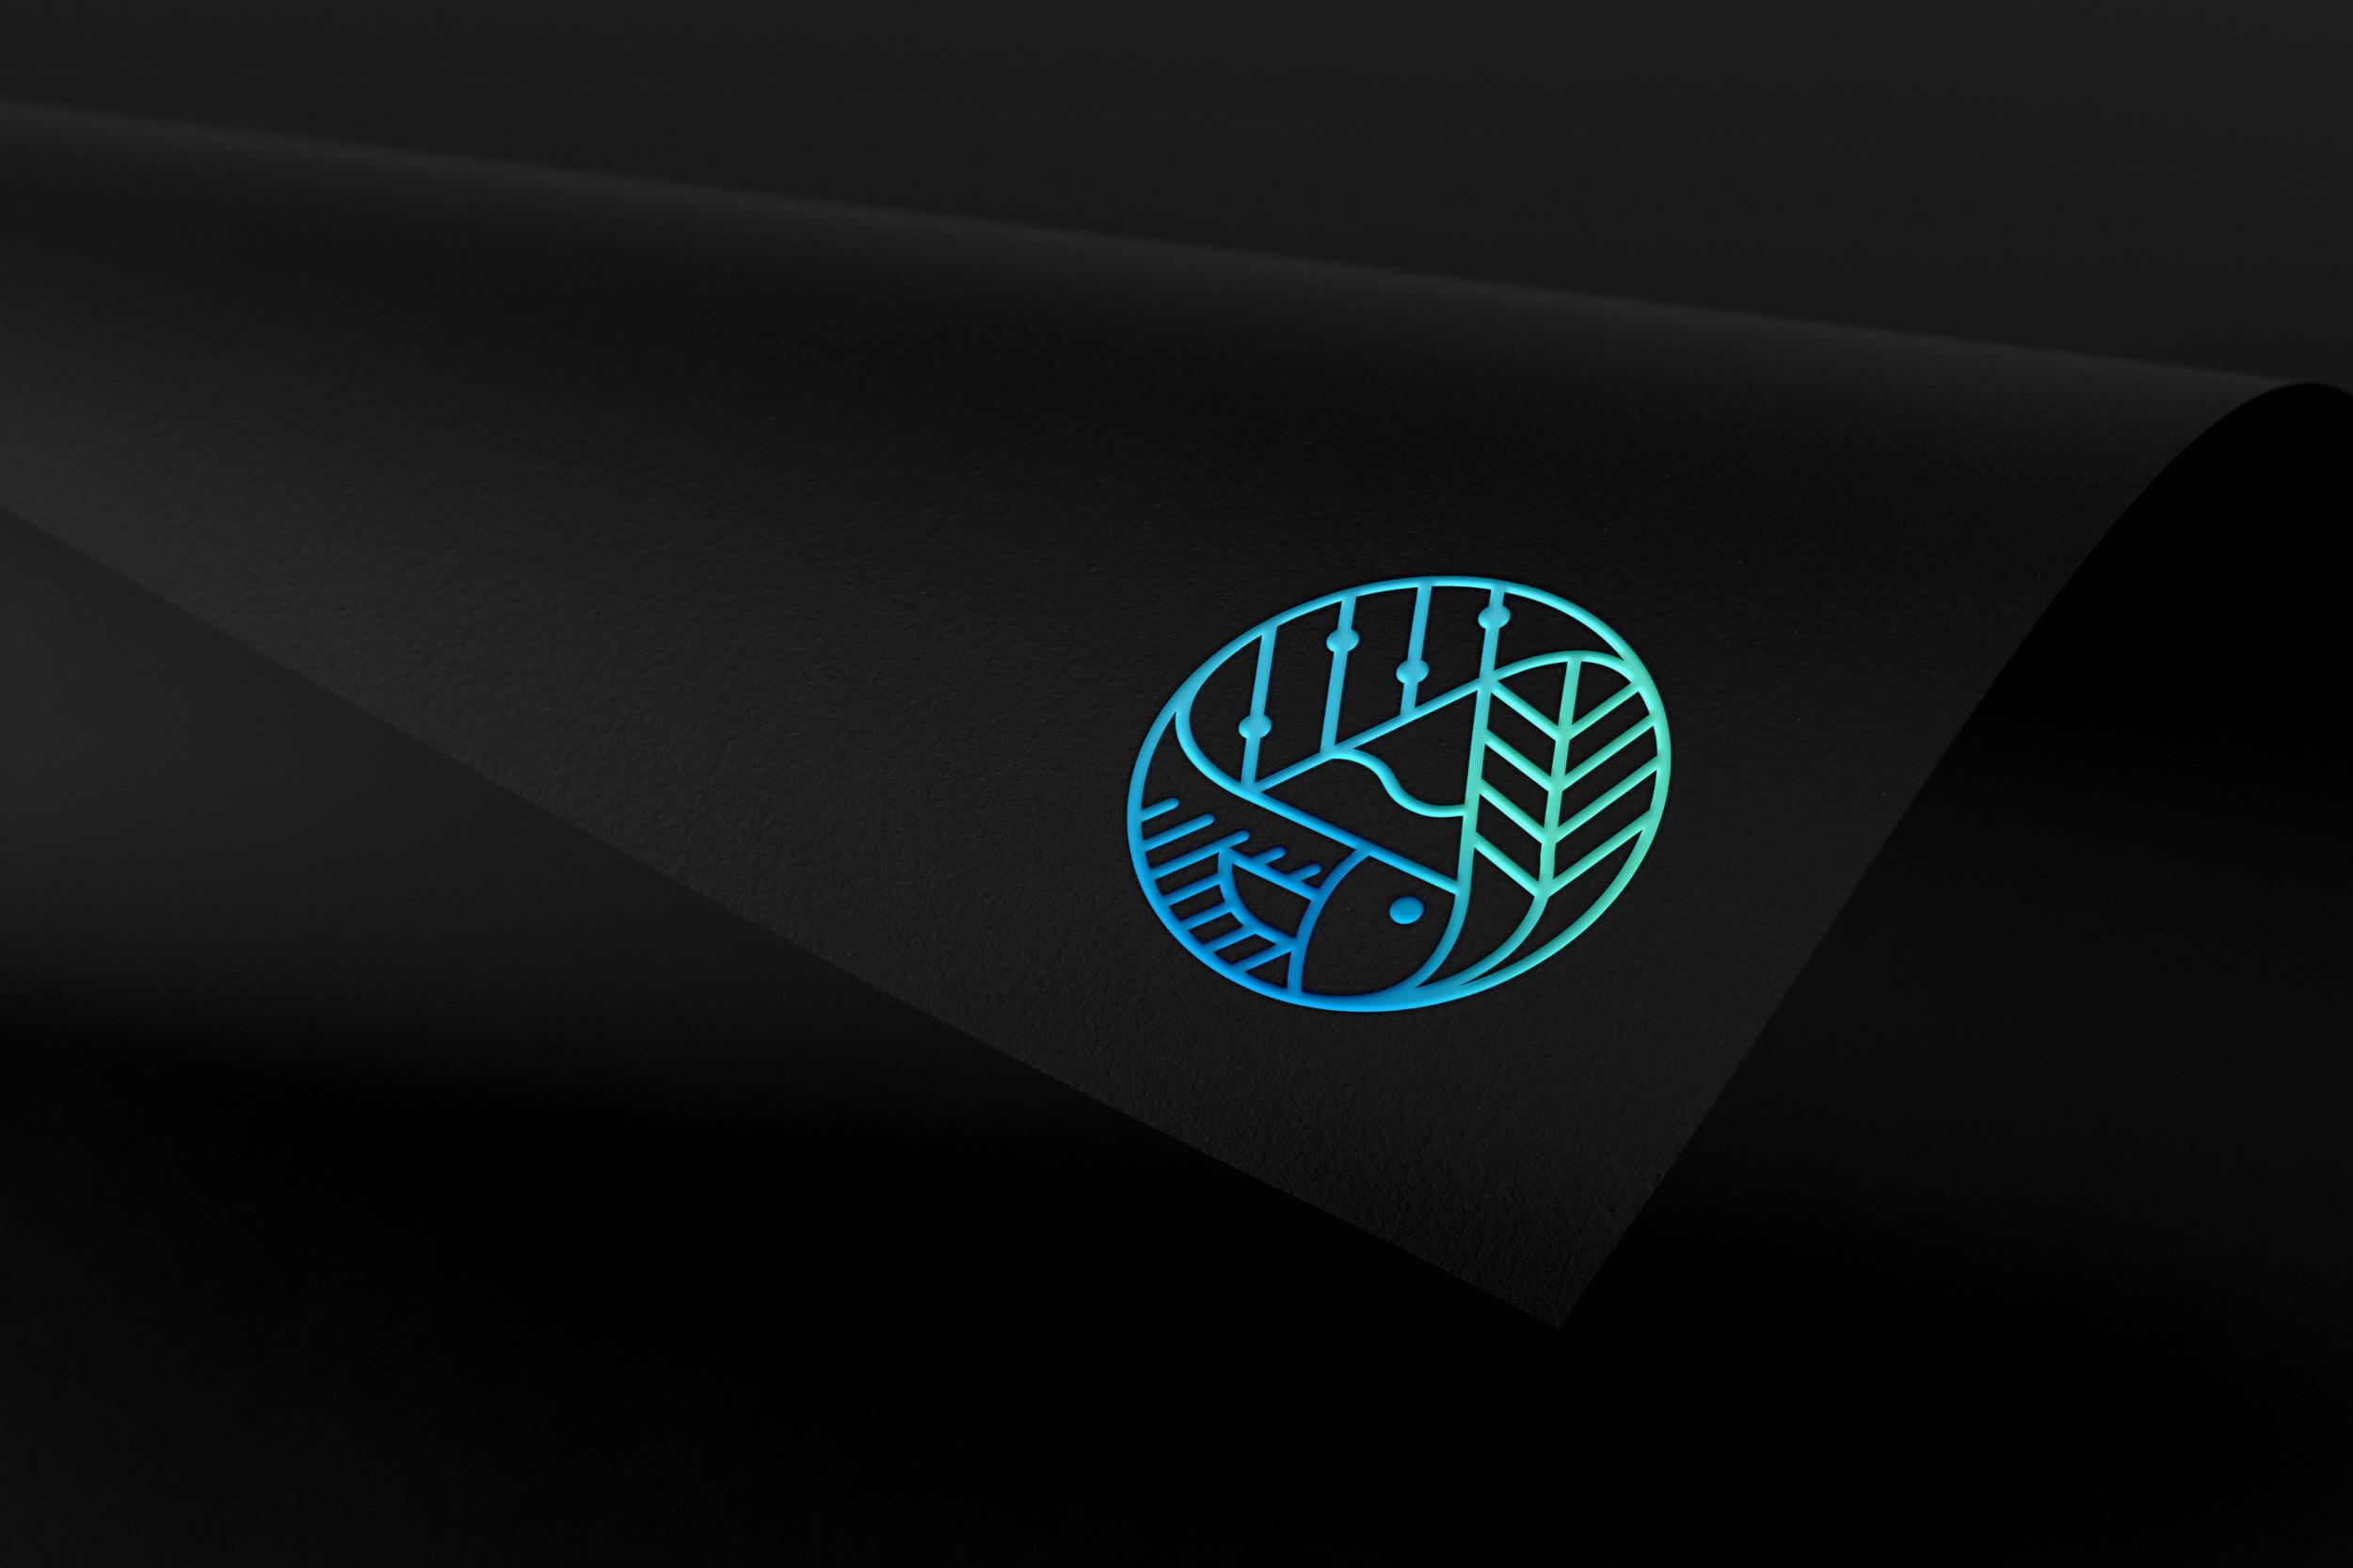 auto-organics-logo-stamp-black-paper.jpg